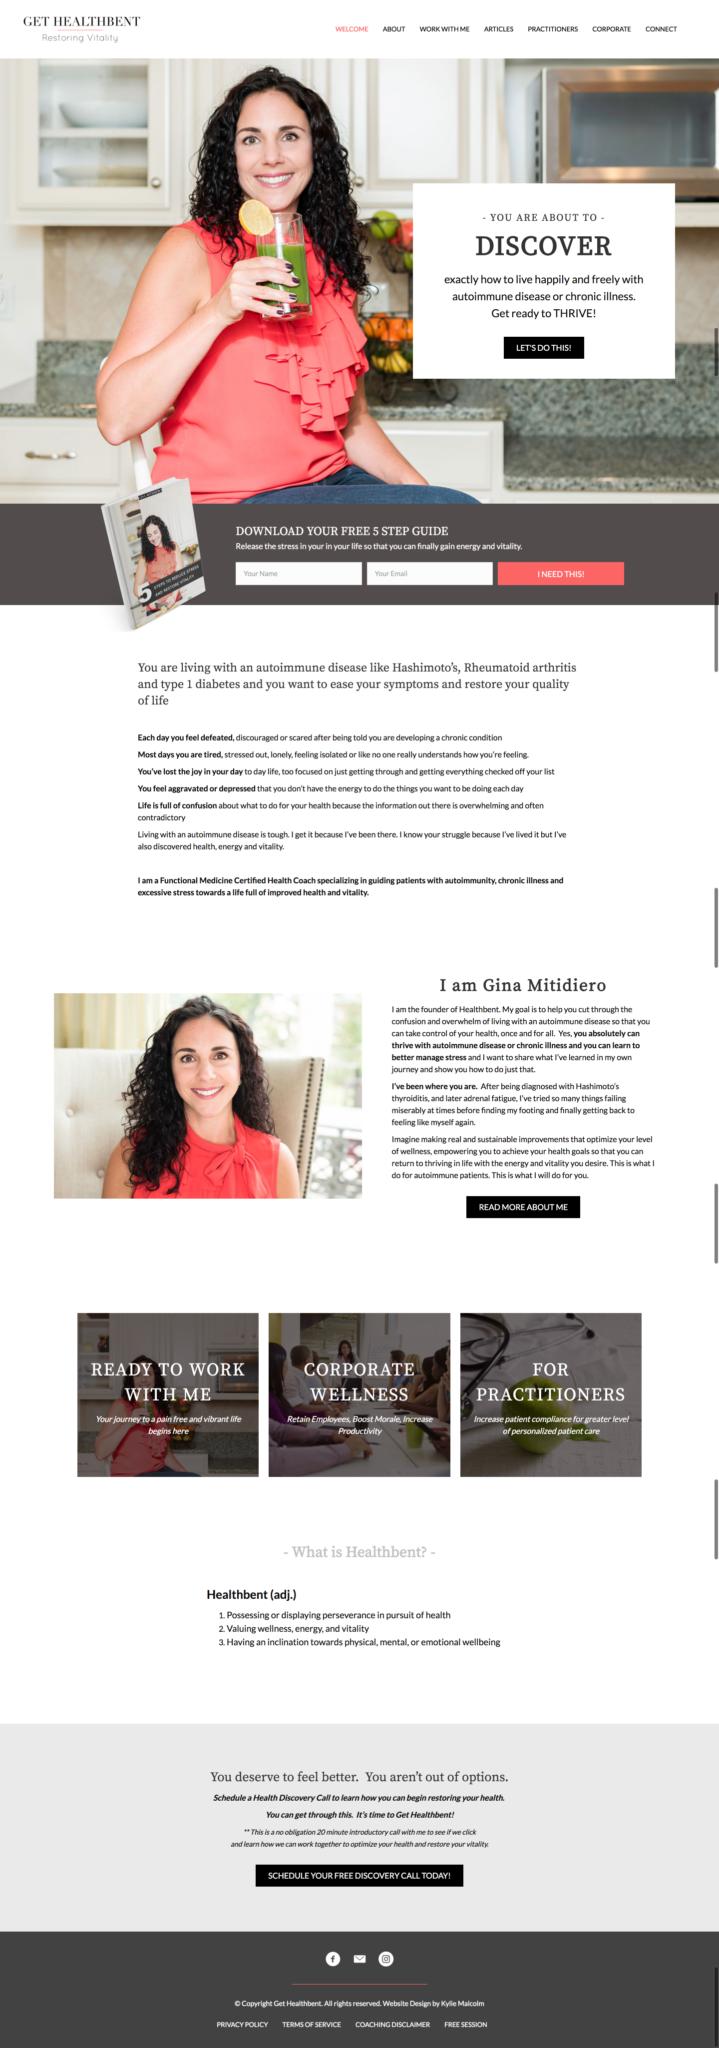 Gethealthbent full page website